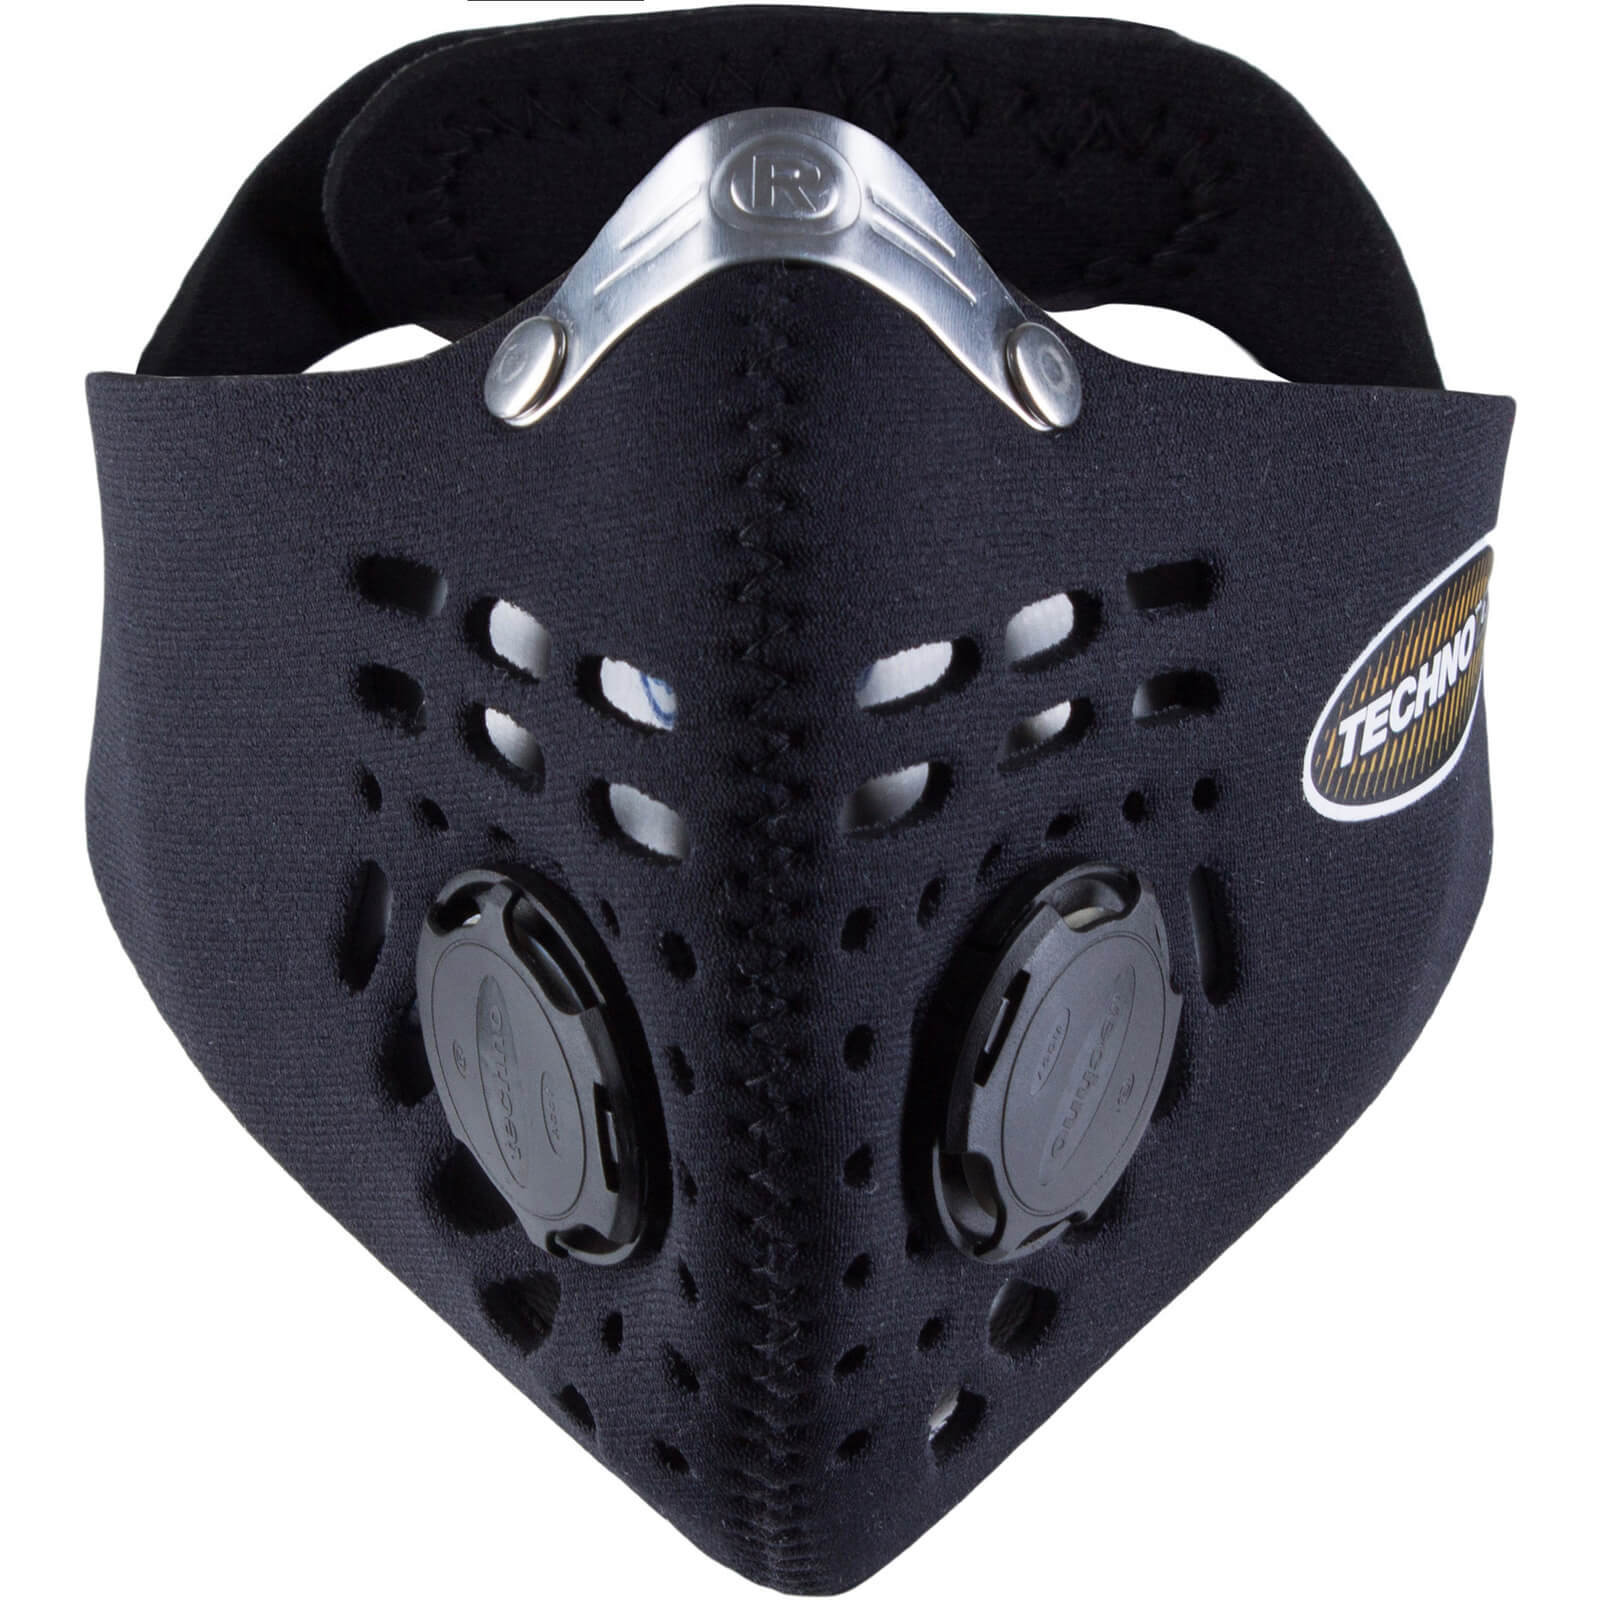 Respro Techno Mask - XL - Black